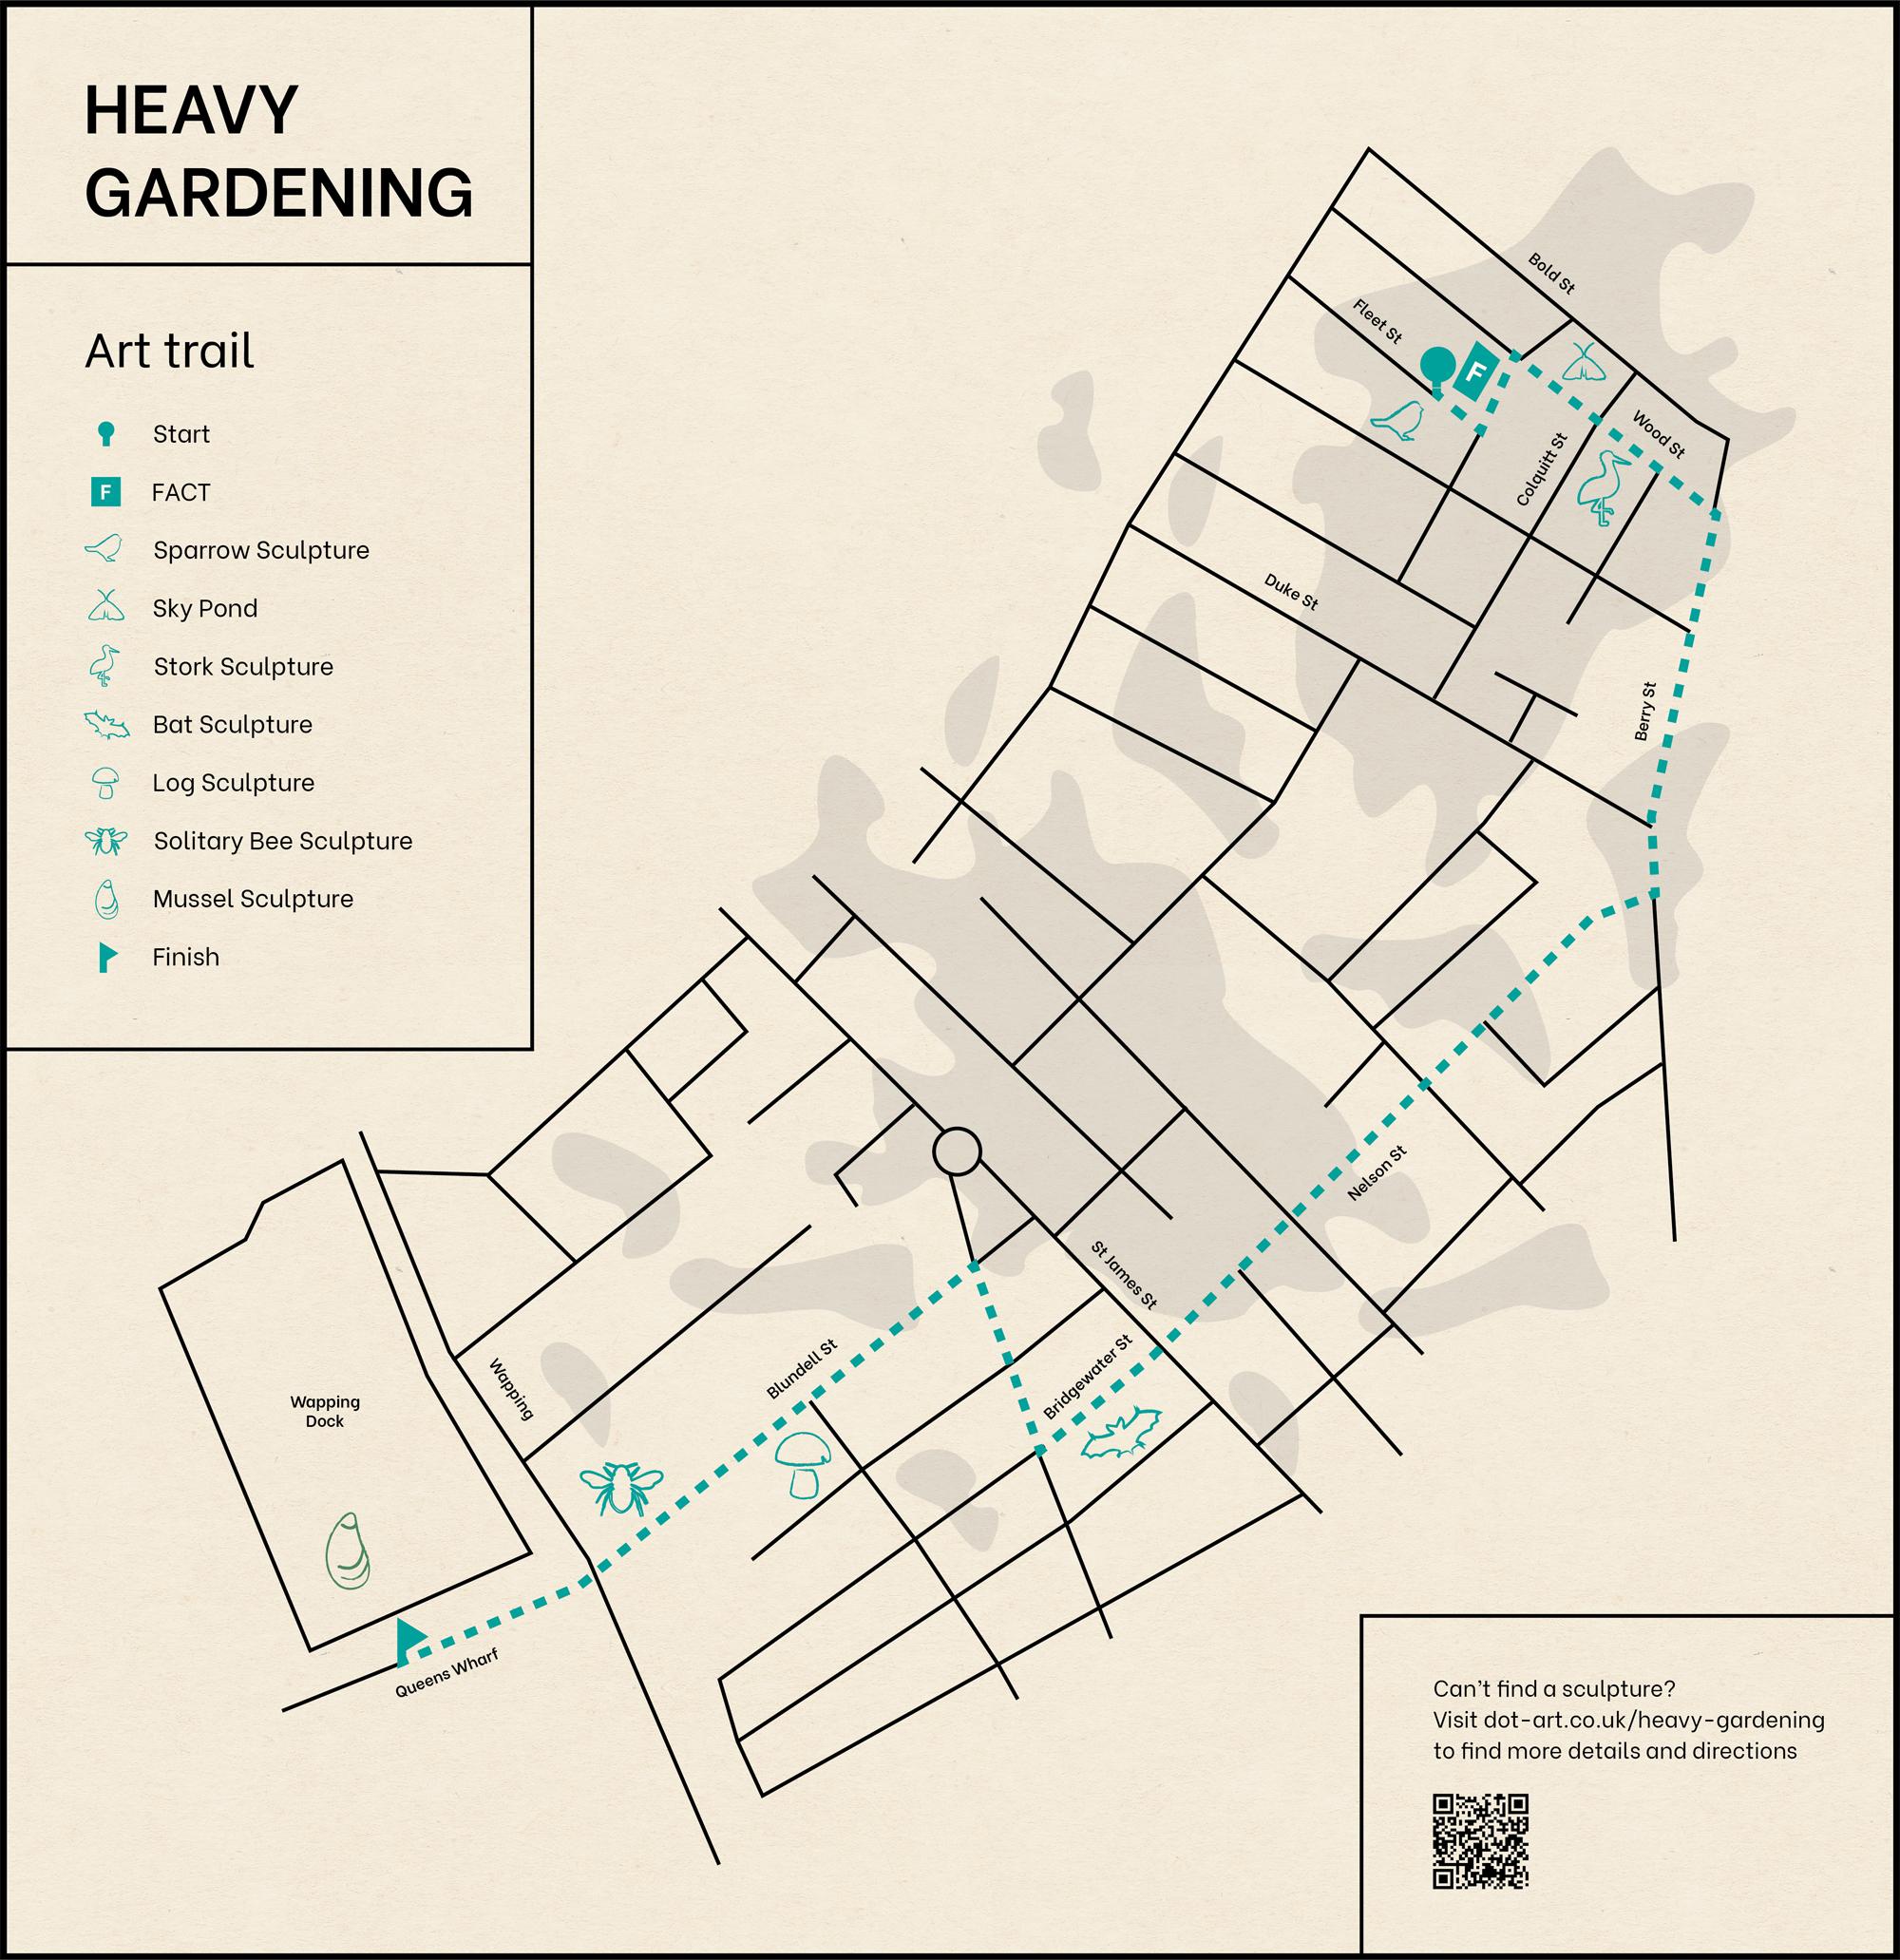 Heavy Gardening Map